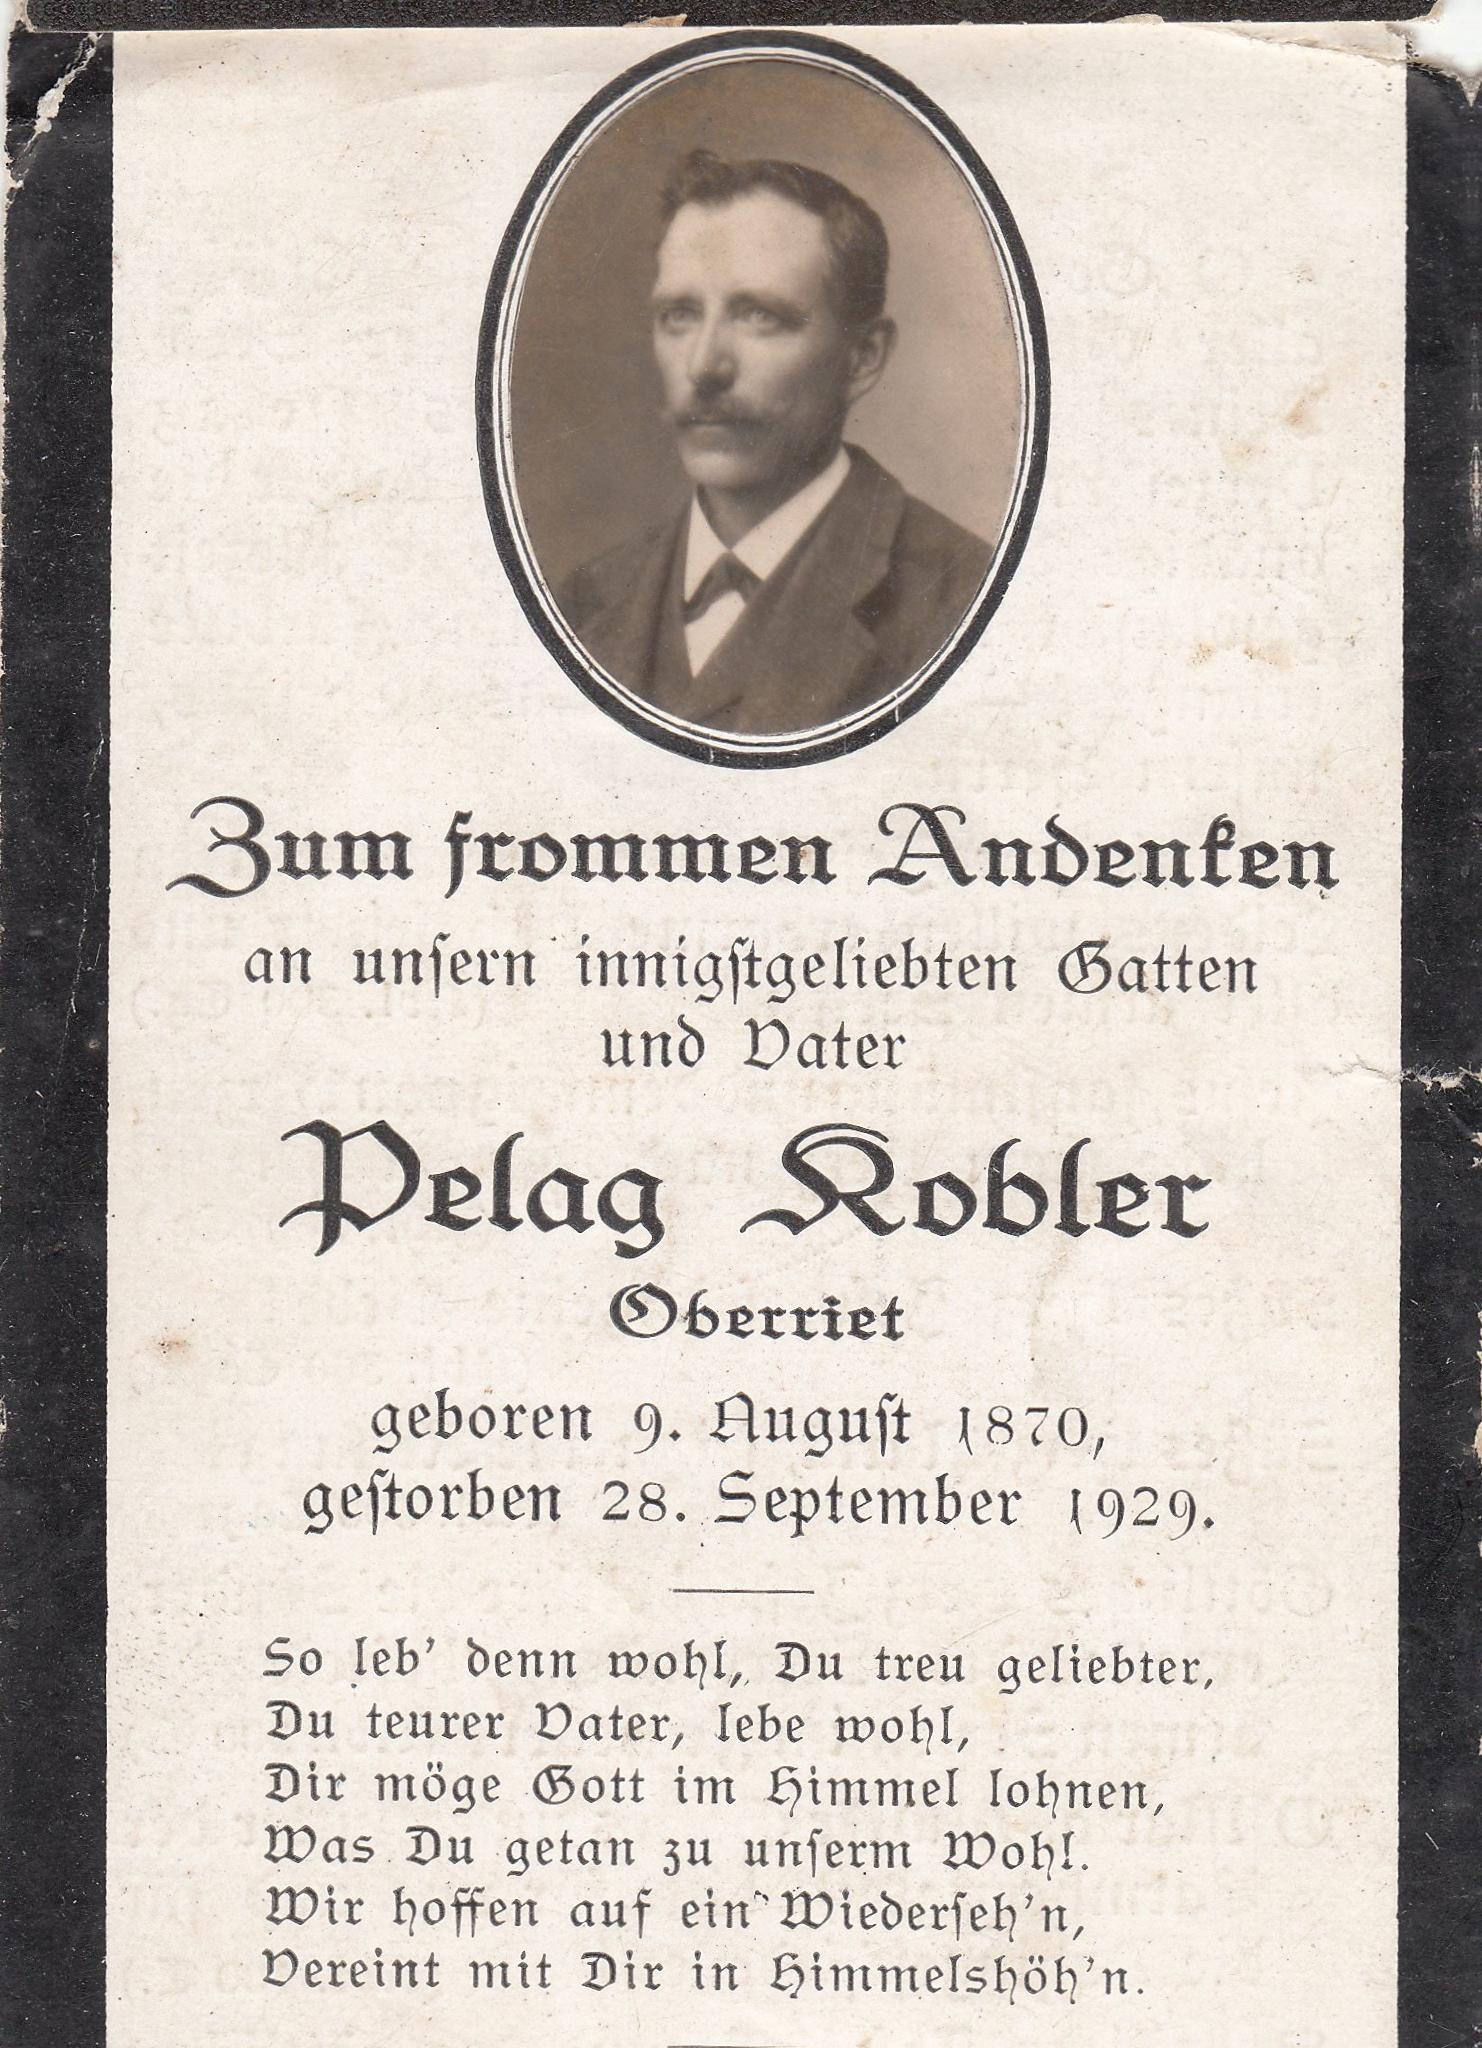 Pelag Kobler (1870-1929)